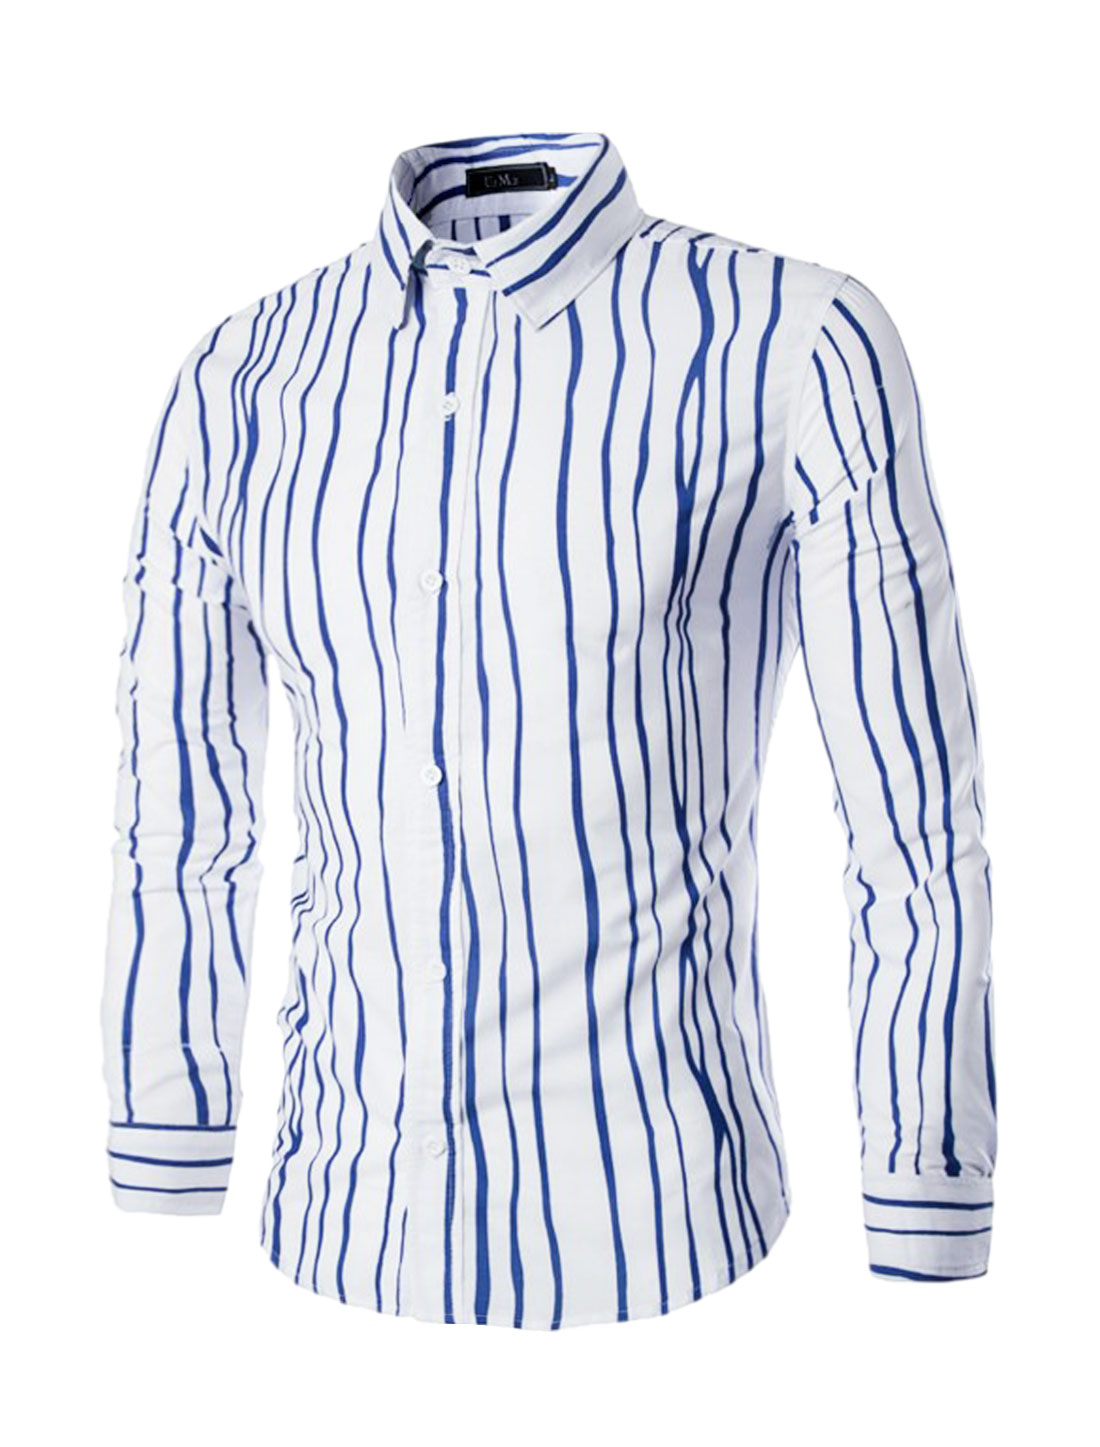 Men Long Sleeves Single Breasted Stripes Slim Fit Shirt Royal Blue M